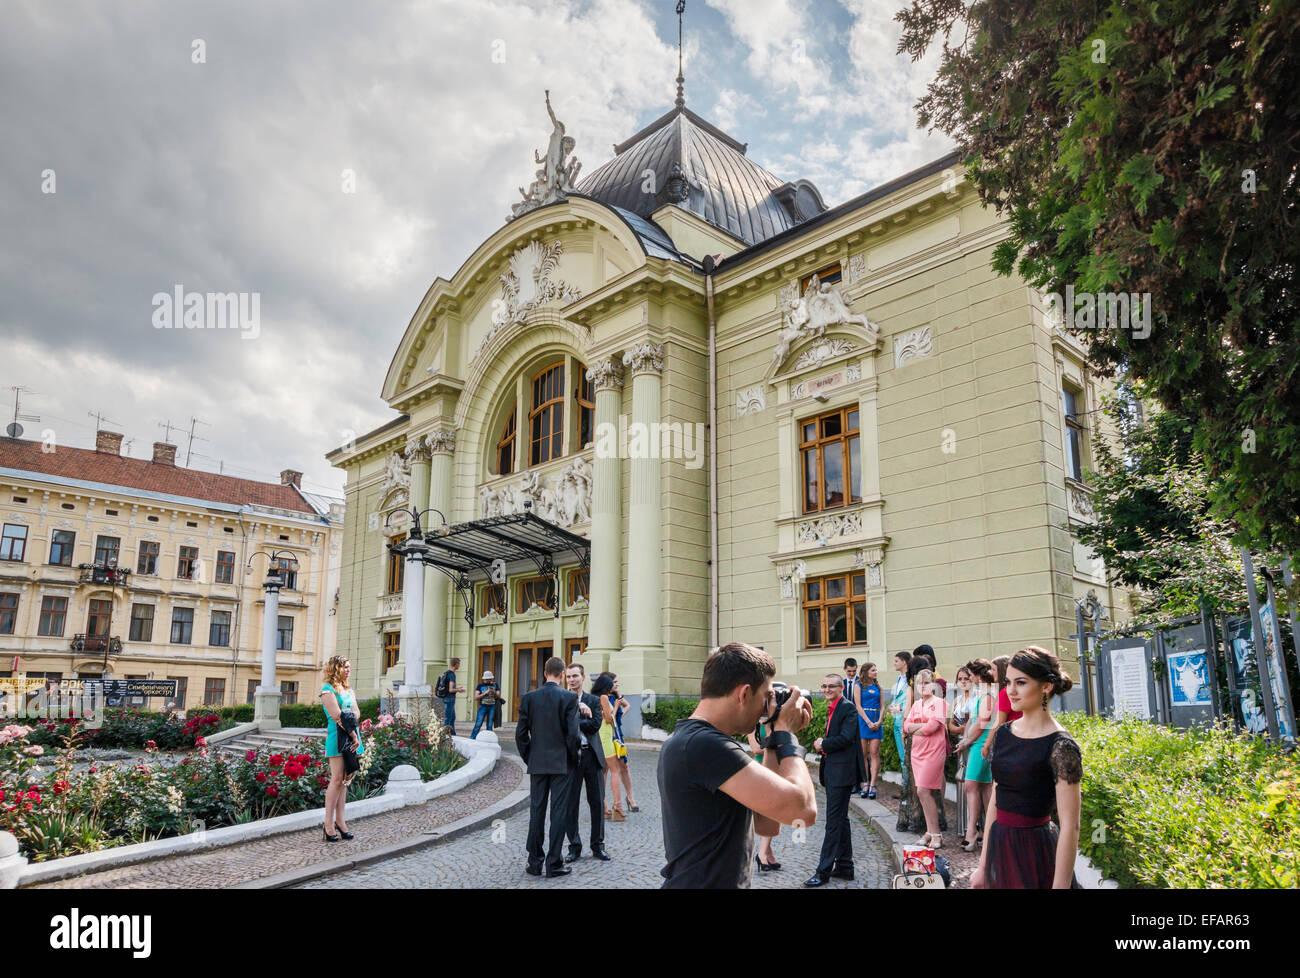 Young women and men at Olha Kobylianska Theatre of Music and Drama, 1905, Theatre Square in Chernivtsi, Bukovina - Stock Image